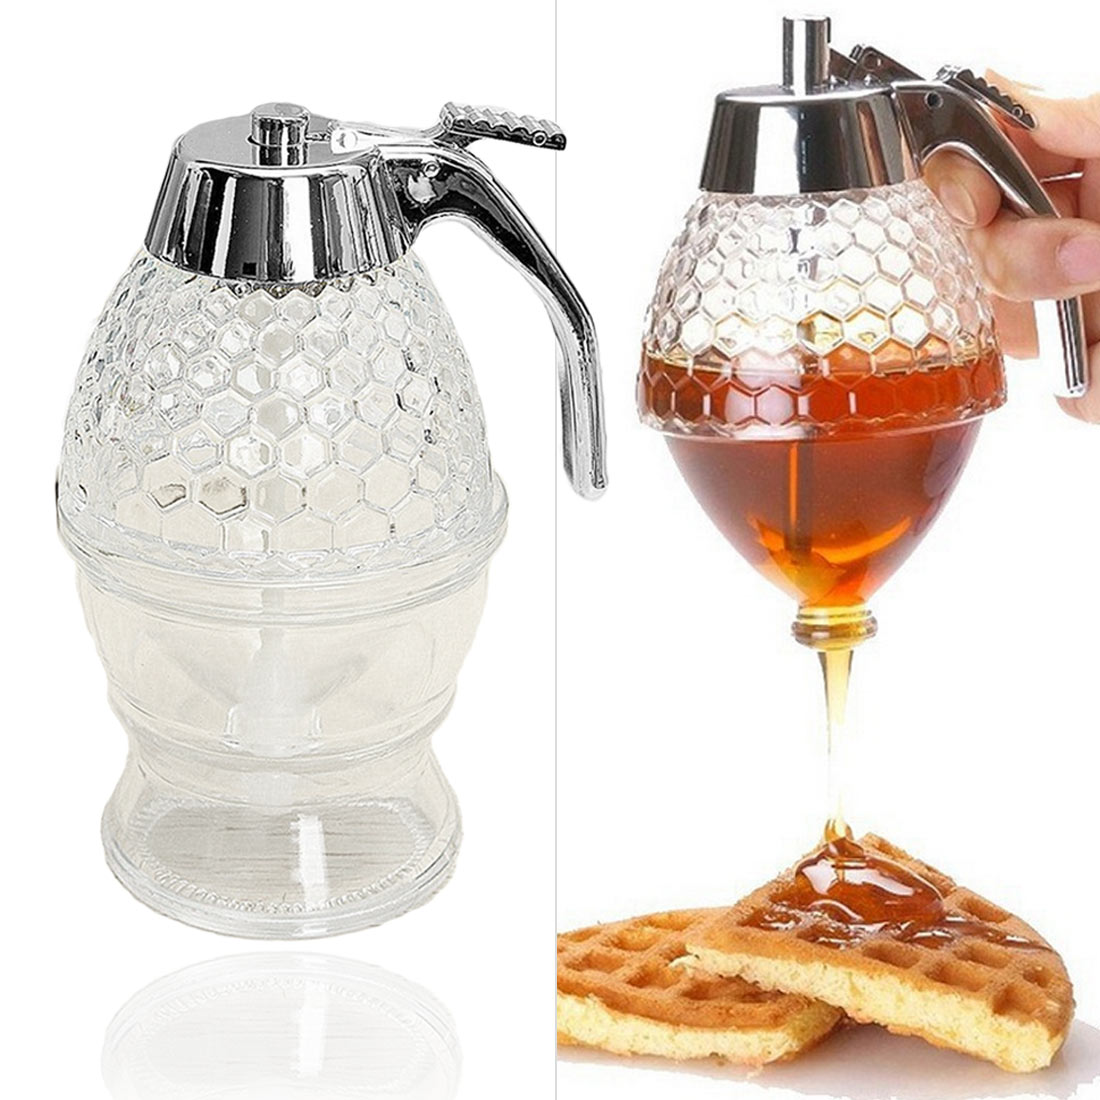 200ml Honey Syrup Dispenser Pot Honeycomb Bottle Honey Squeeze Dispenser Mini Juice Syrup Cup Bee Drip Dispenser Portable